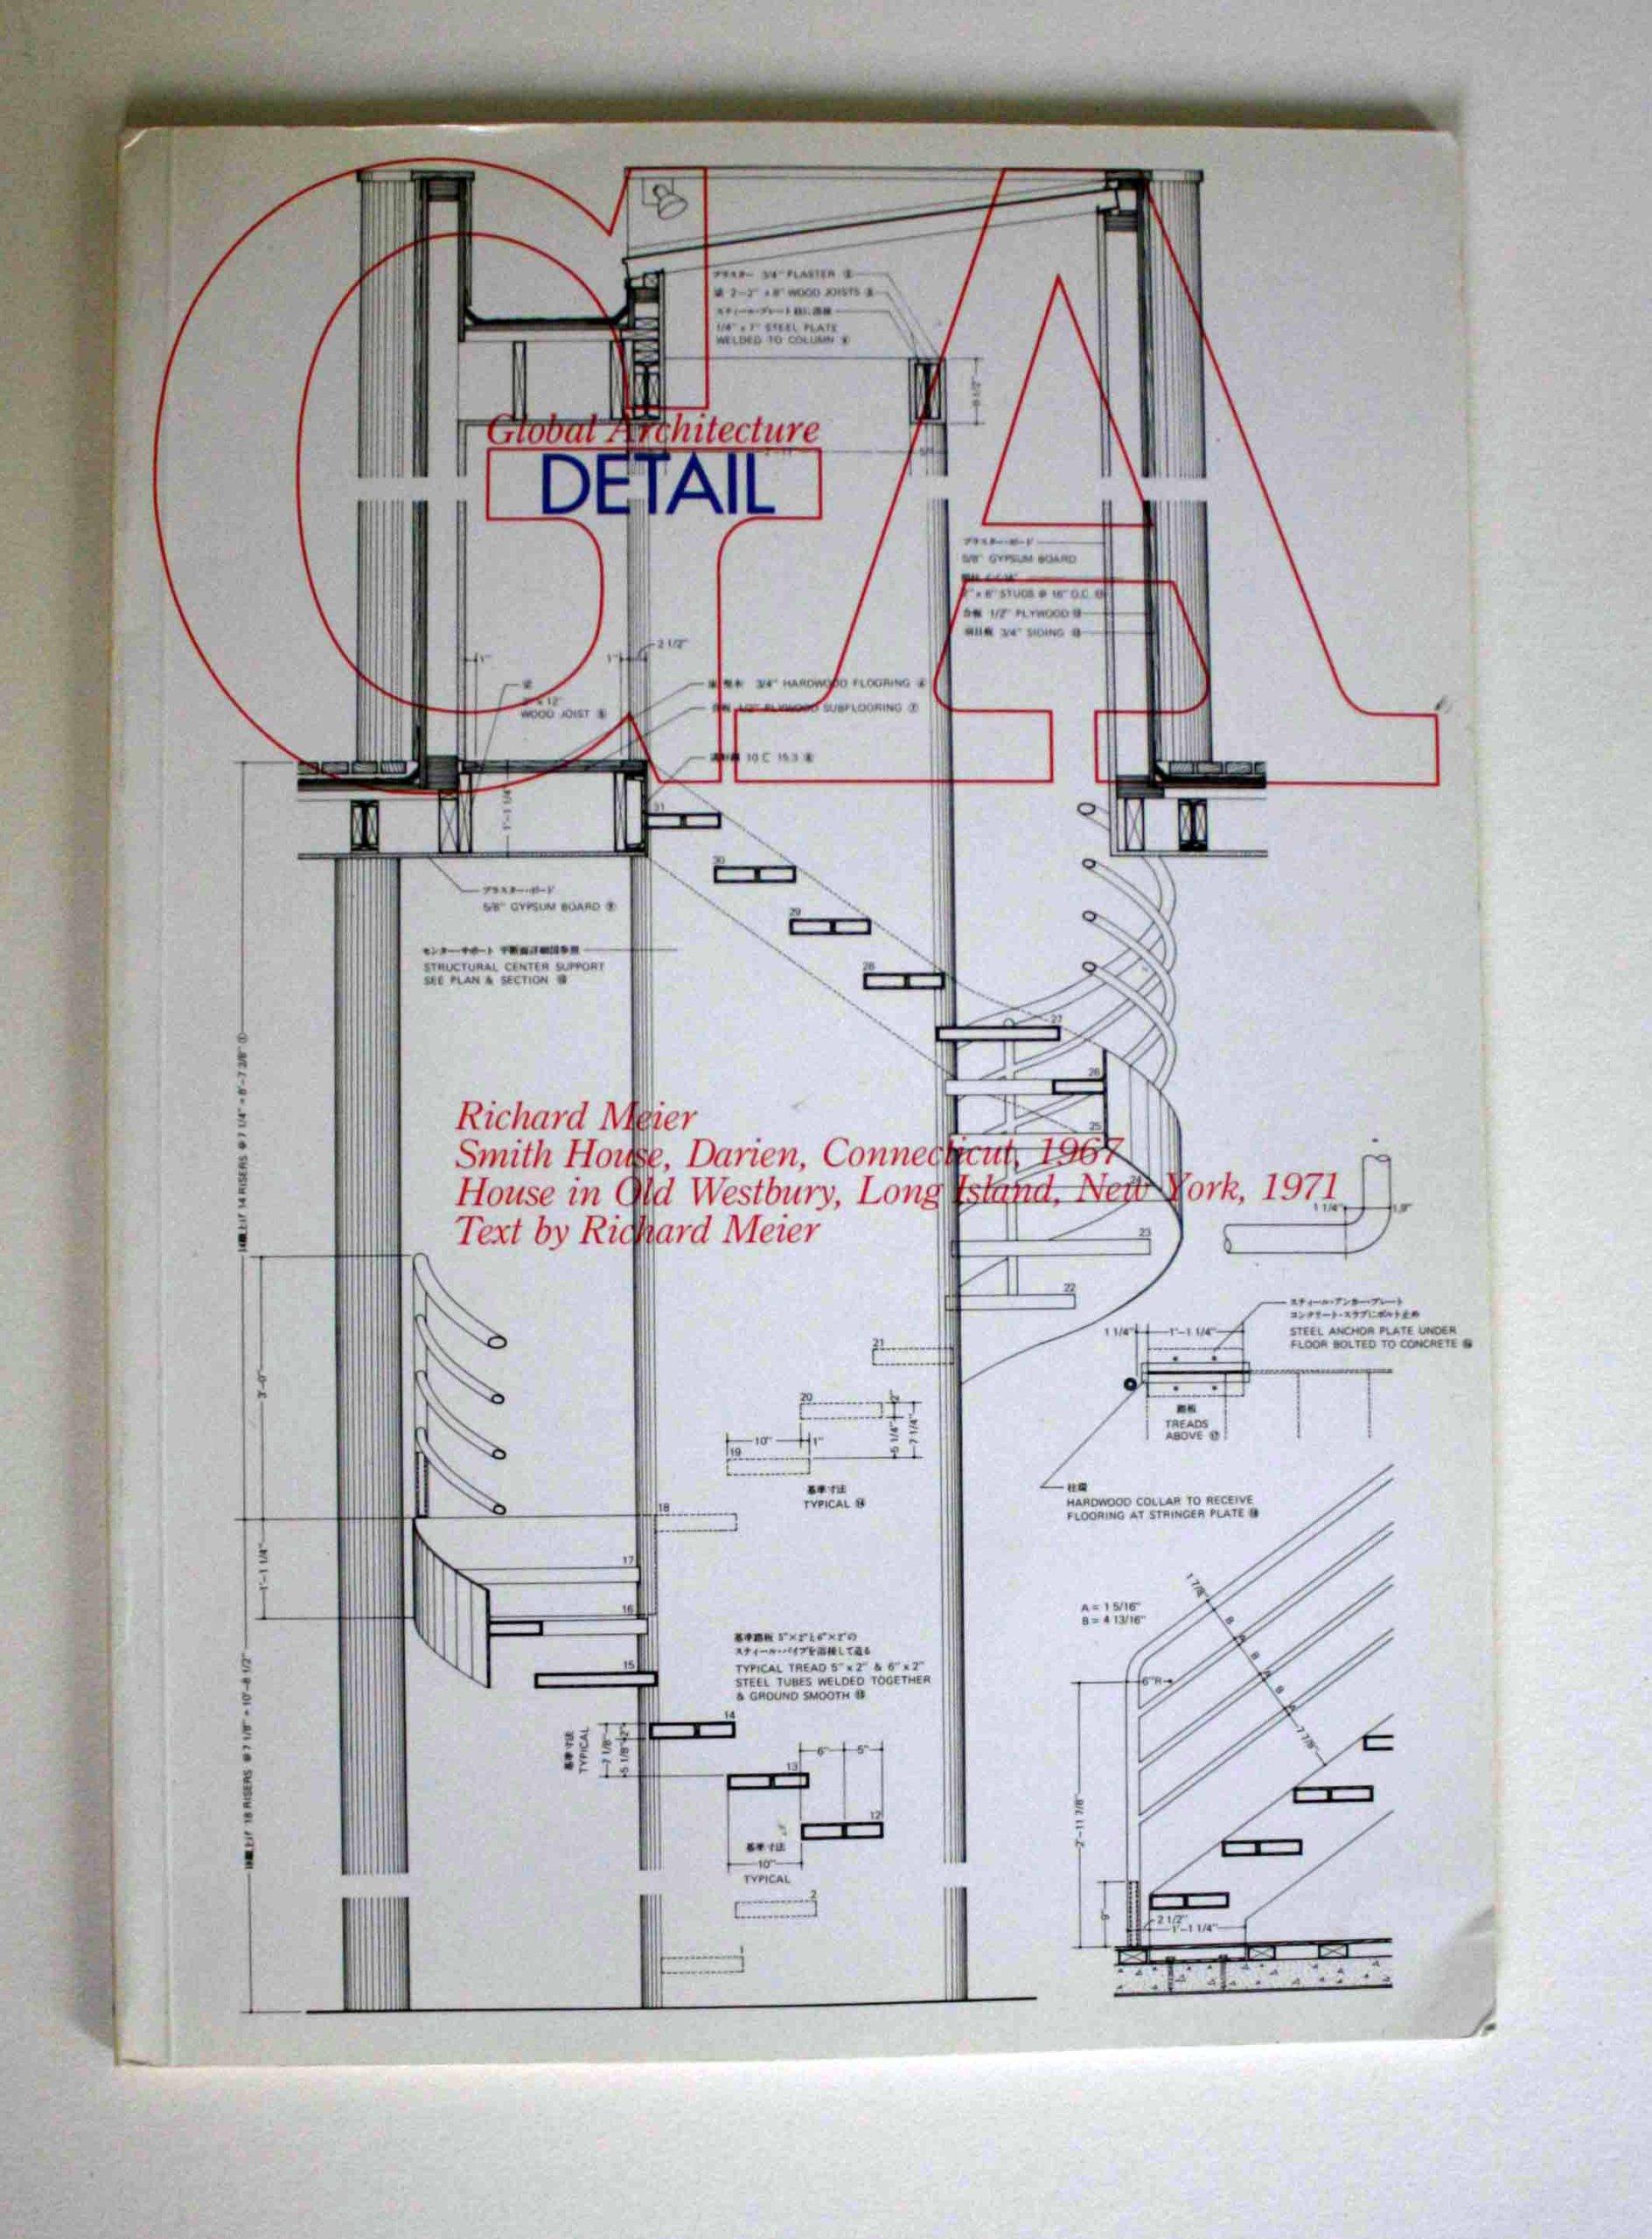 Global Architecture 2 Richard Meier Smith House Darien – Richard Meier Smith House Floor Plans